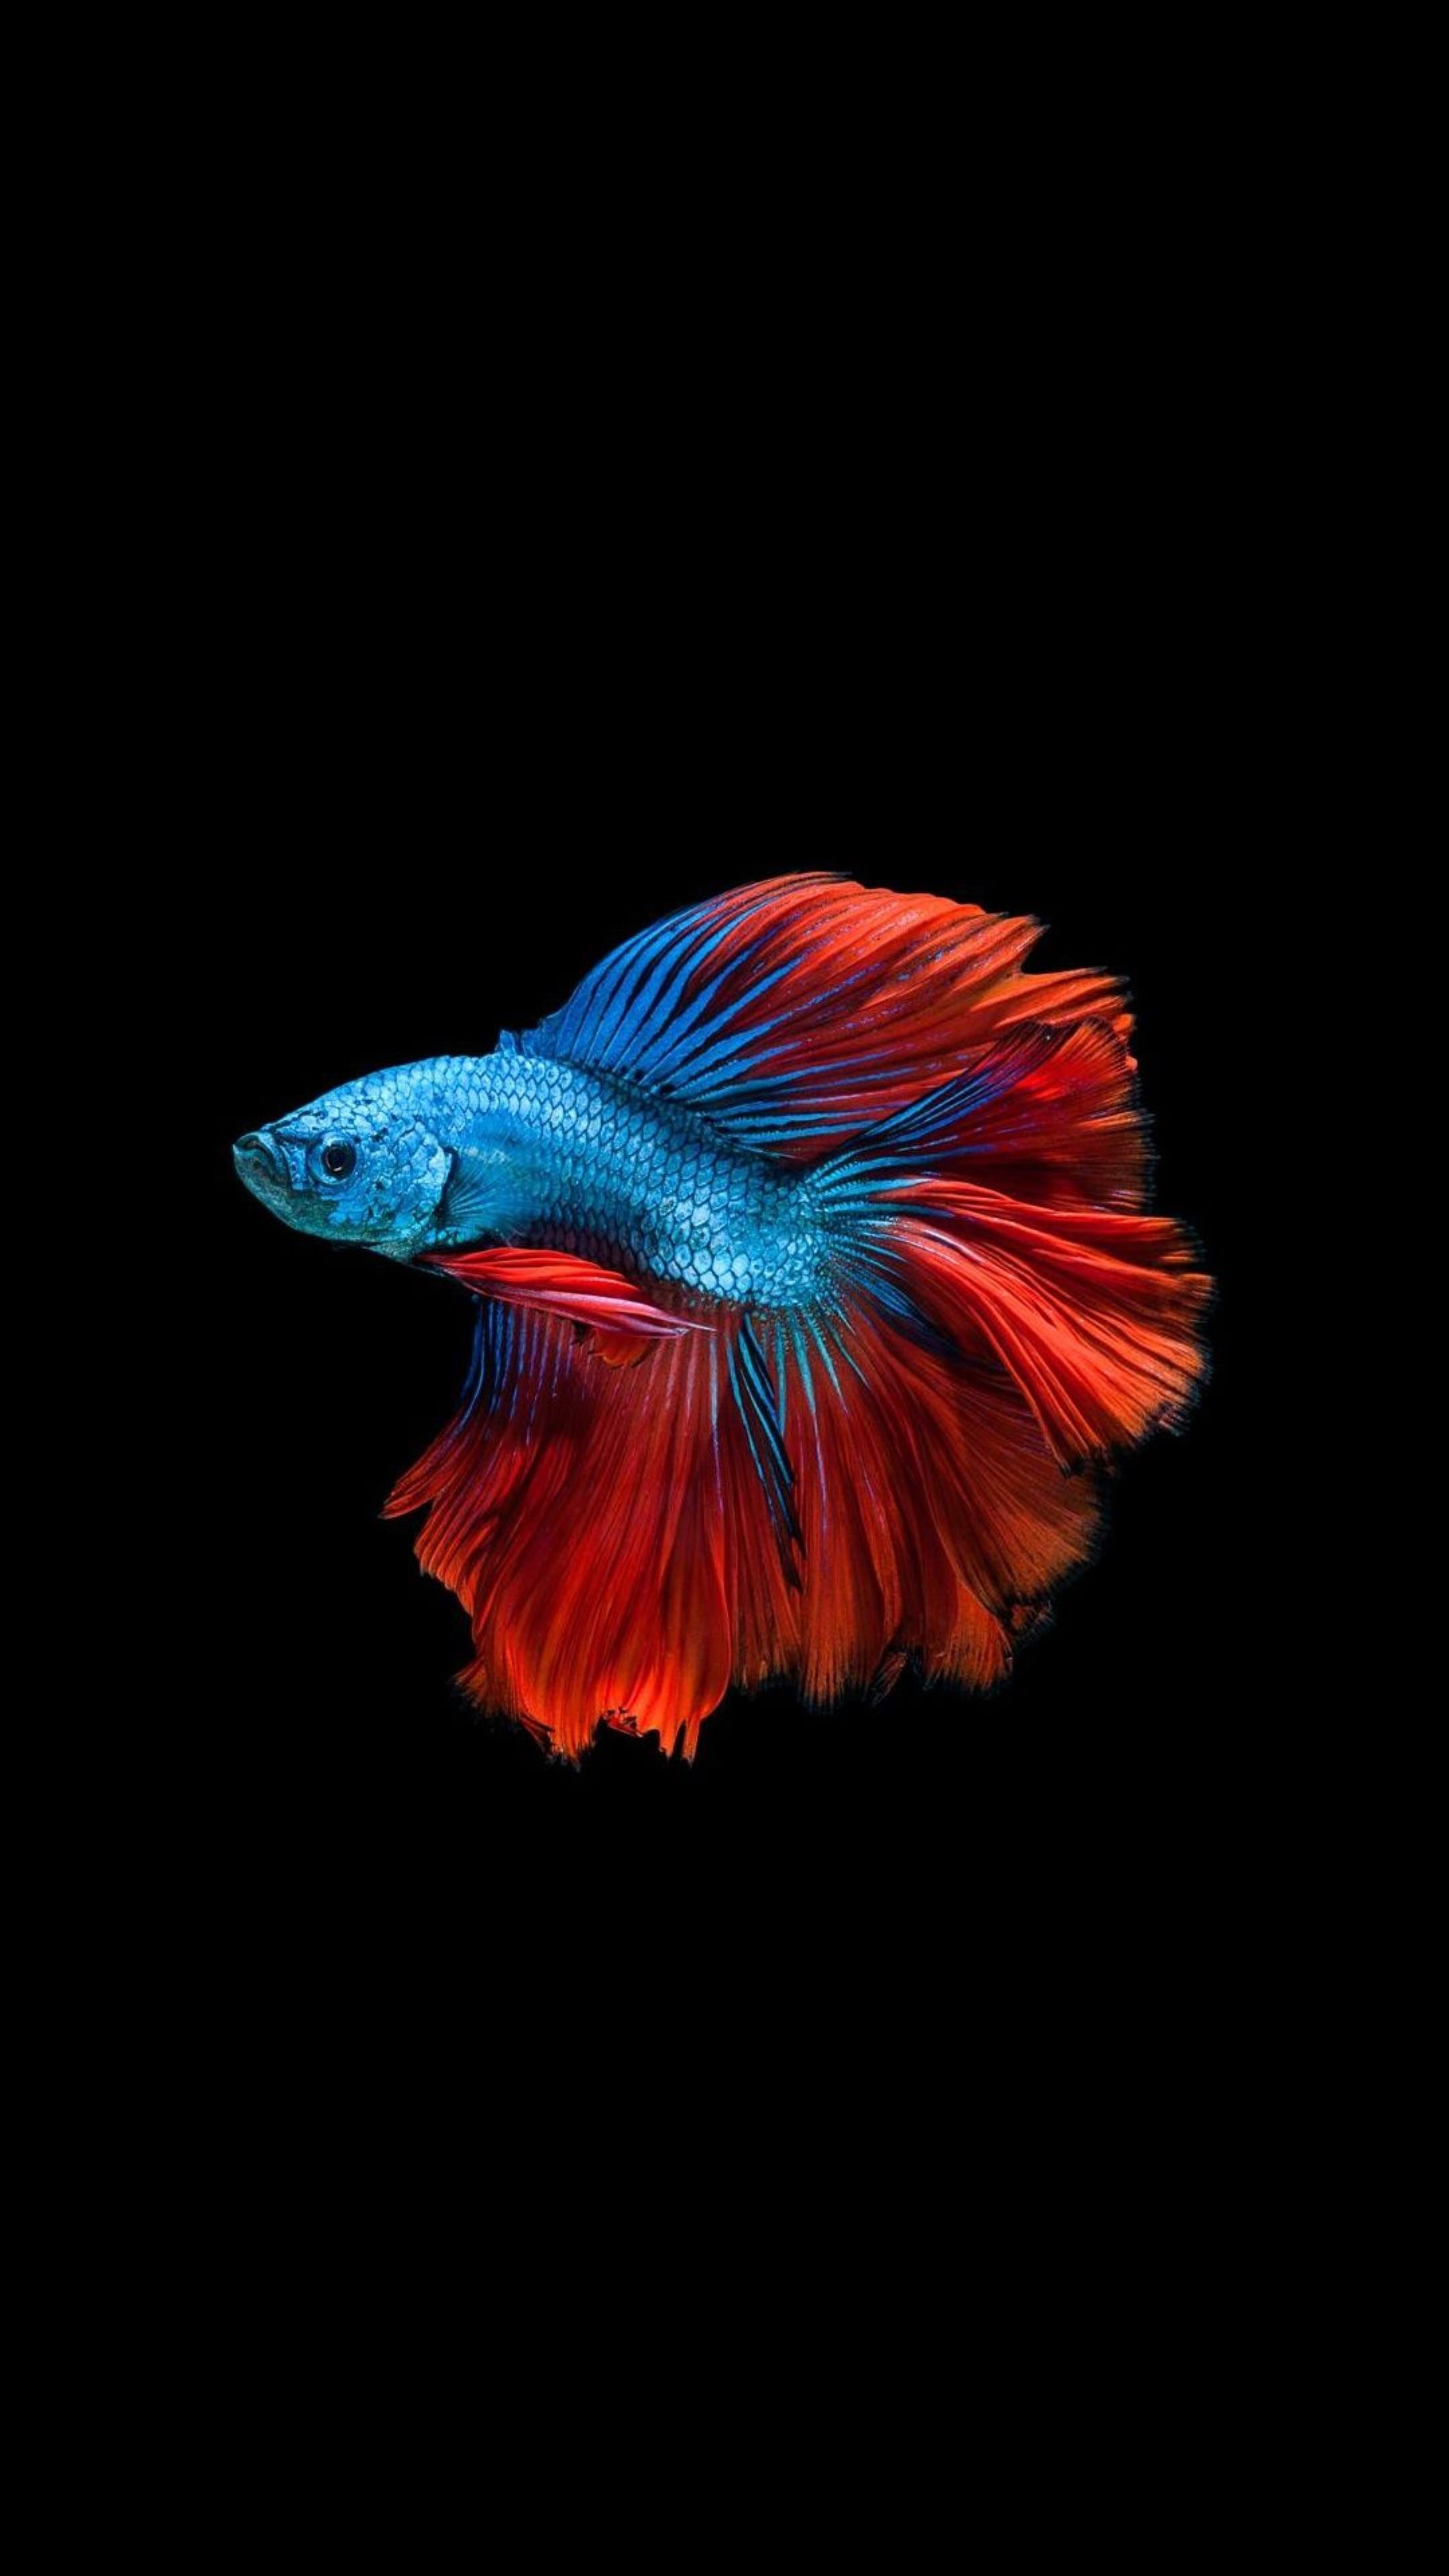 Amoled Animal Wallpaper Ikan Cupang Hewan Burung Cantik